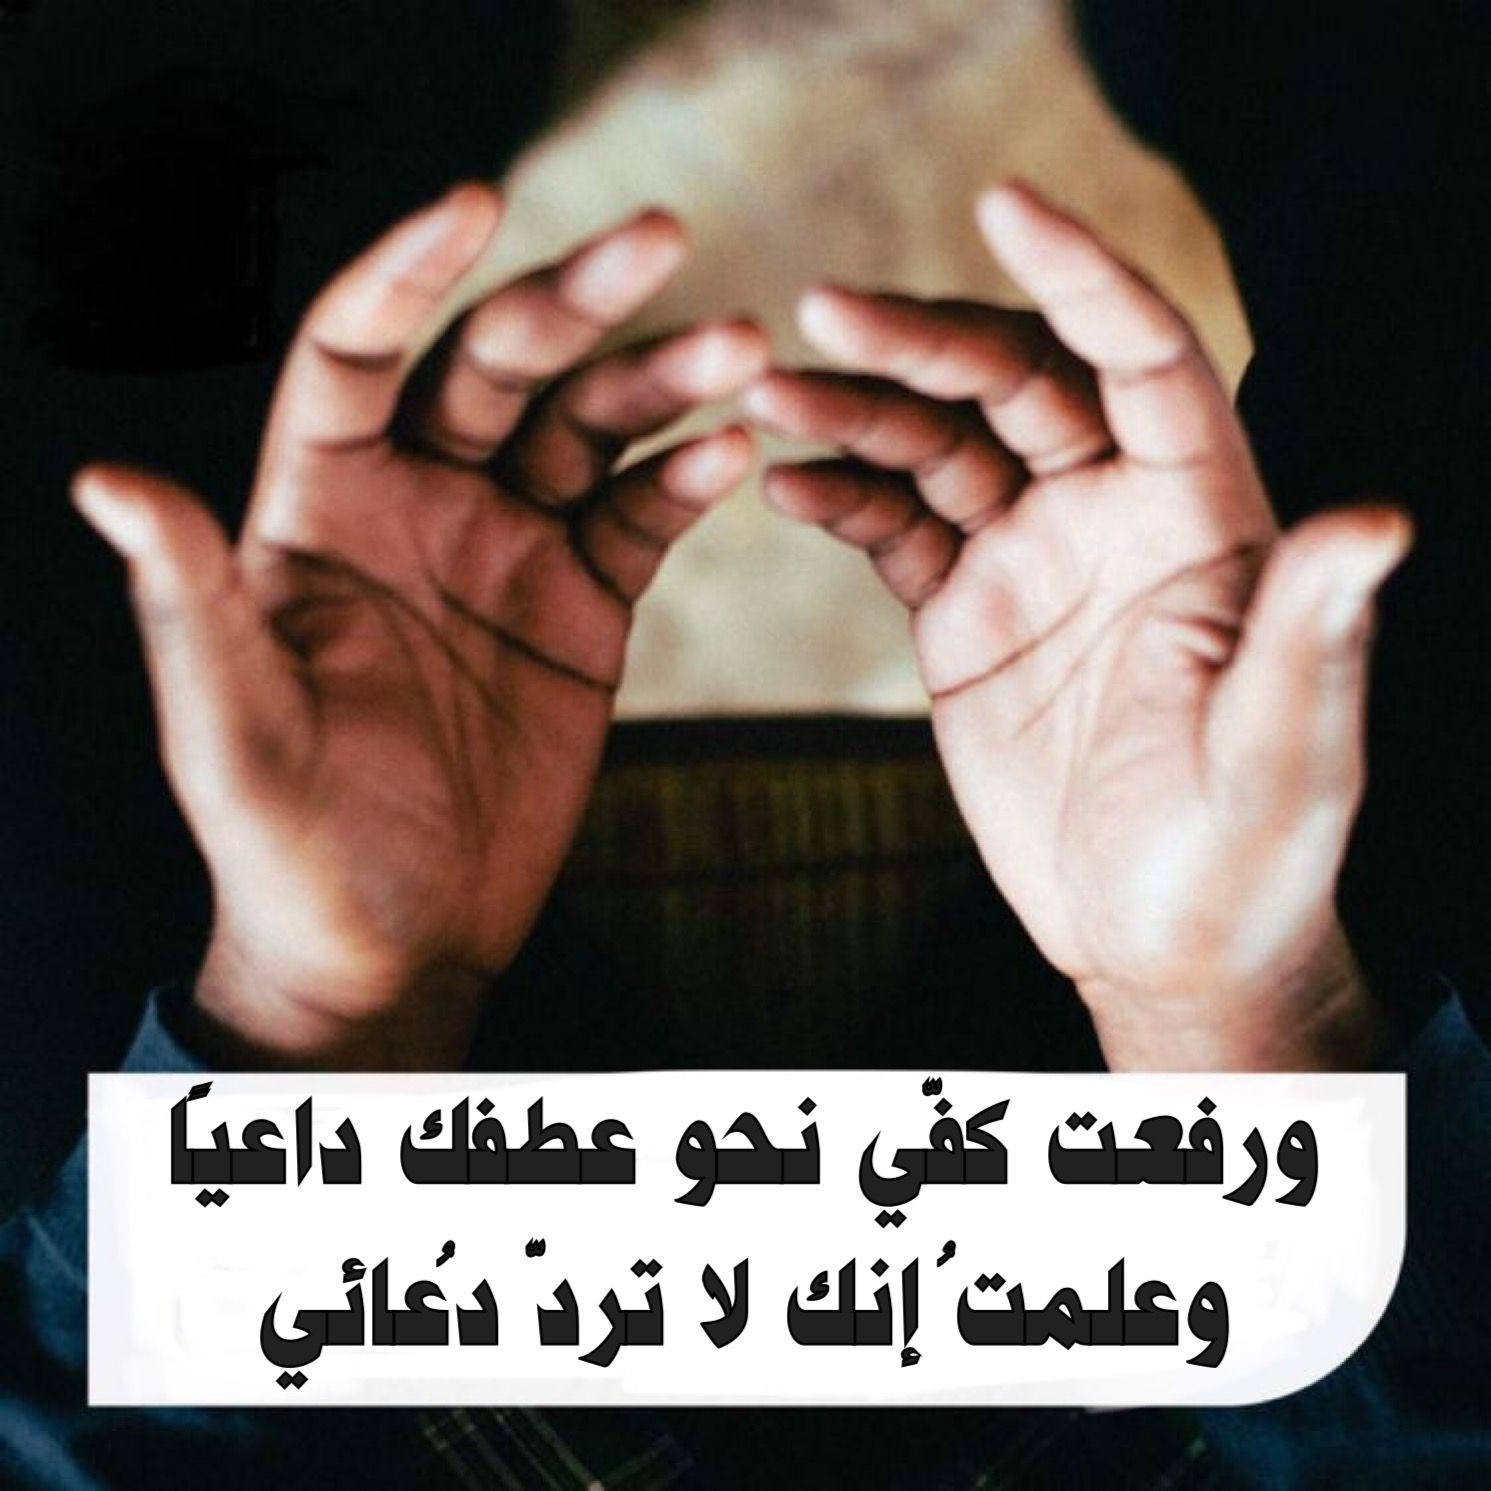 Pin By الأثر الجميل On دعاء Holding Hands Hands